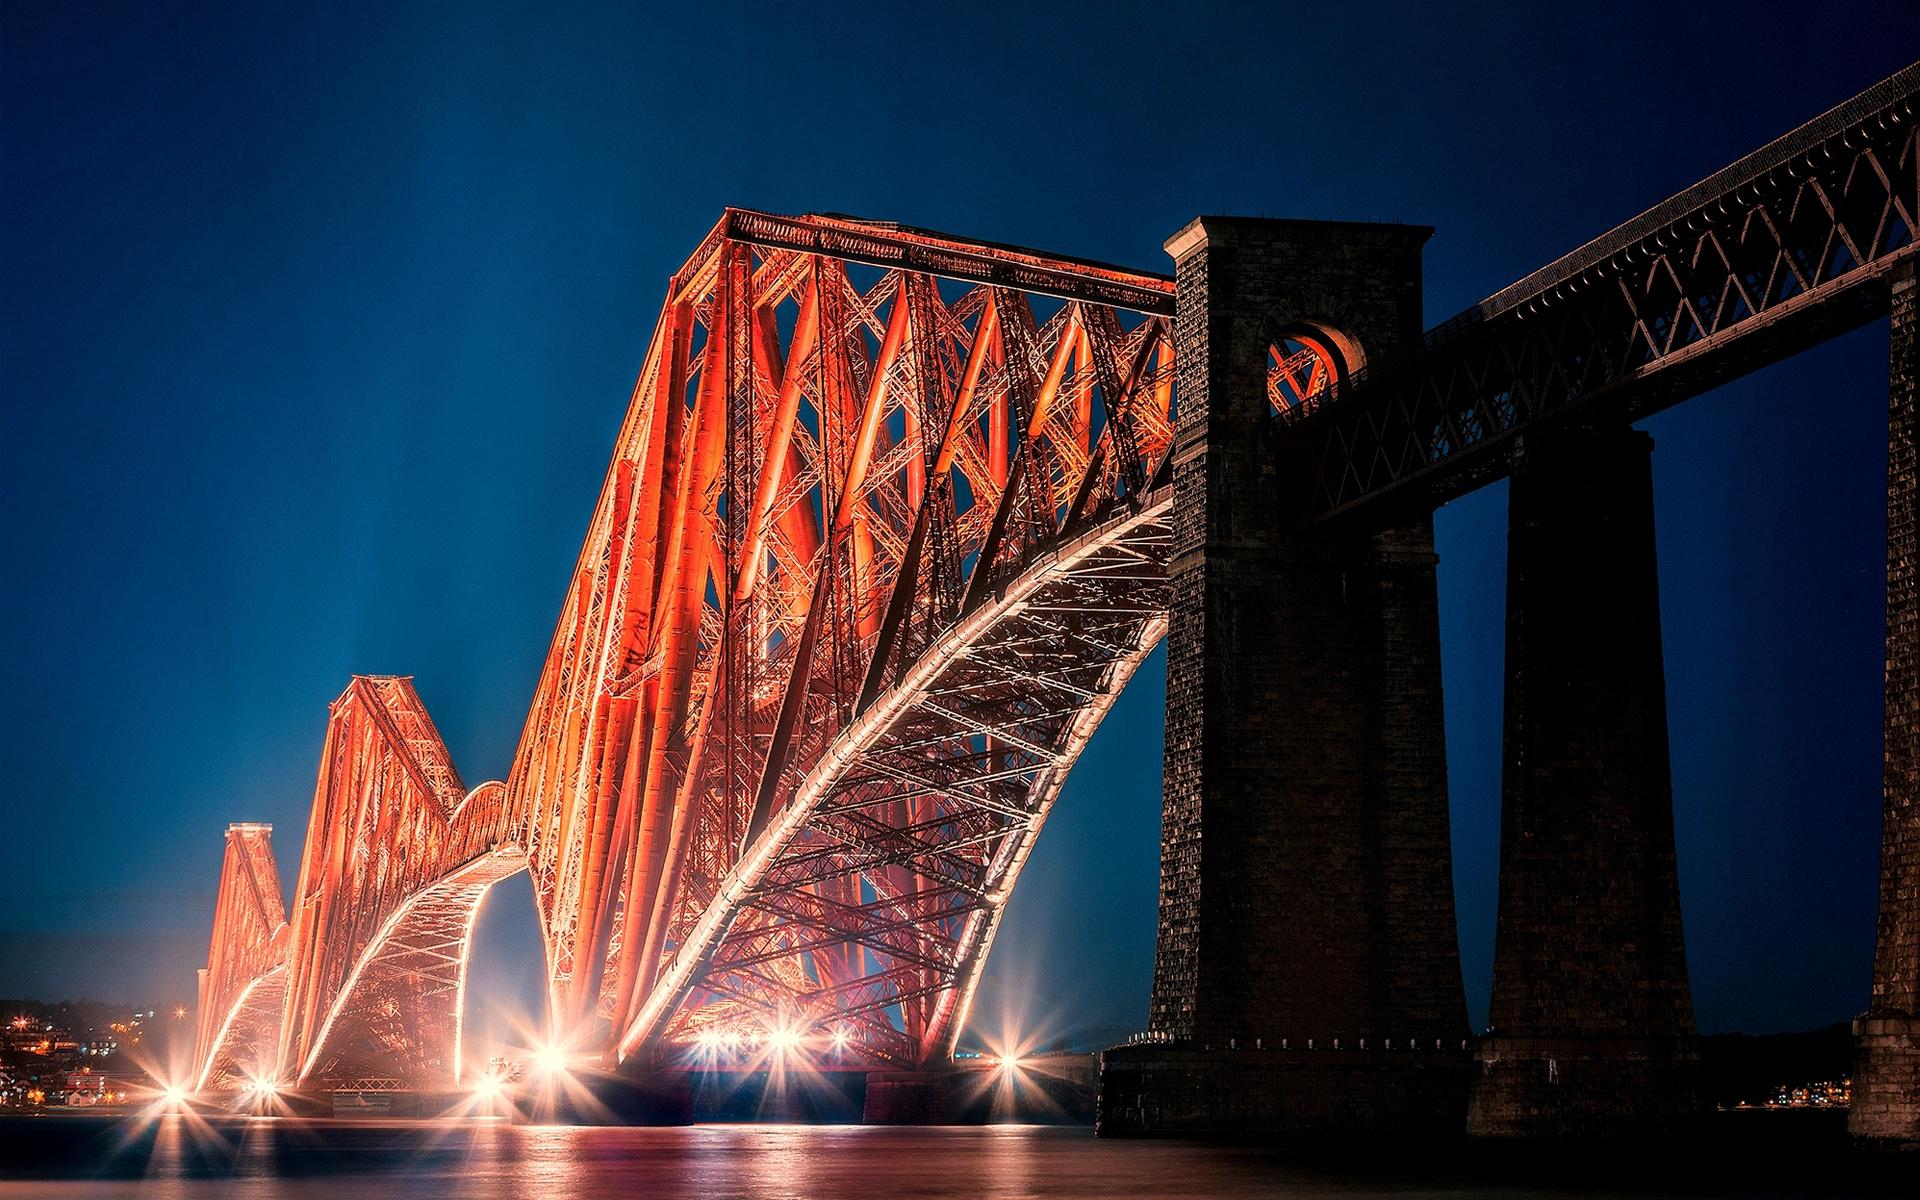 3d Wallpaper City Lights The Forth Bridge Edinburgh Wallpapers Hd Wallpapers Id